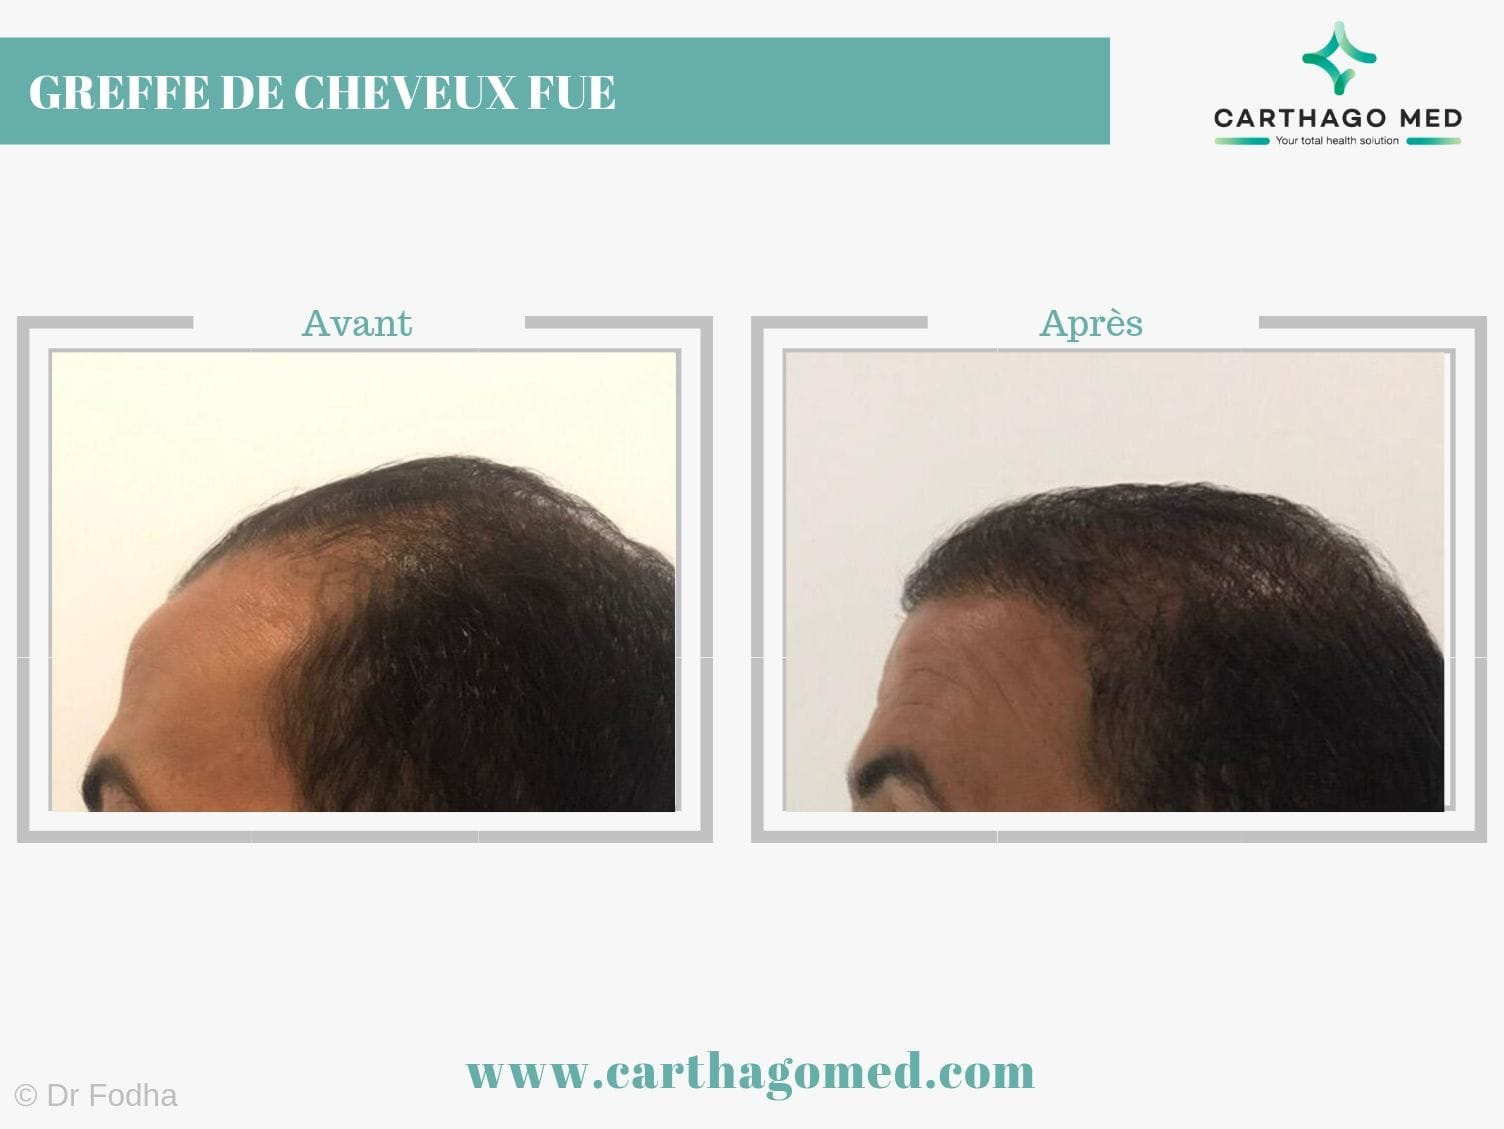 Greffe de cheveux 1 Carthago Med-min (3)